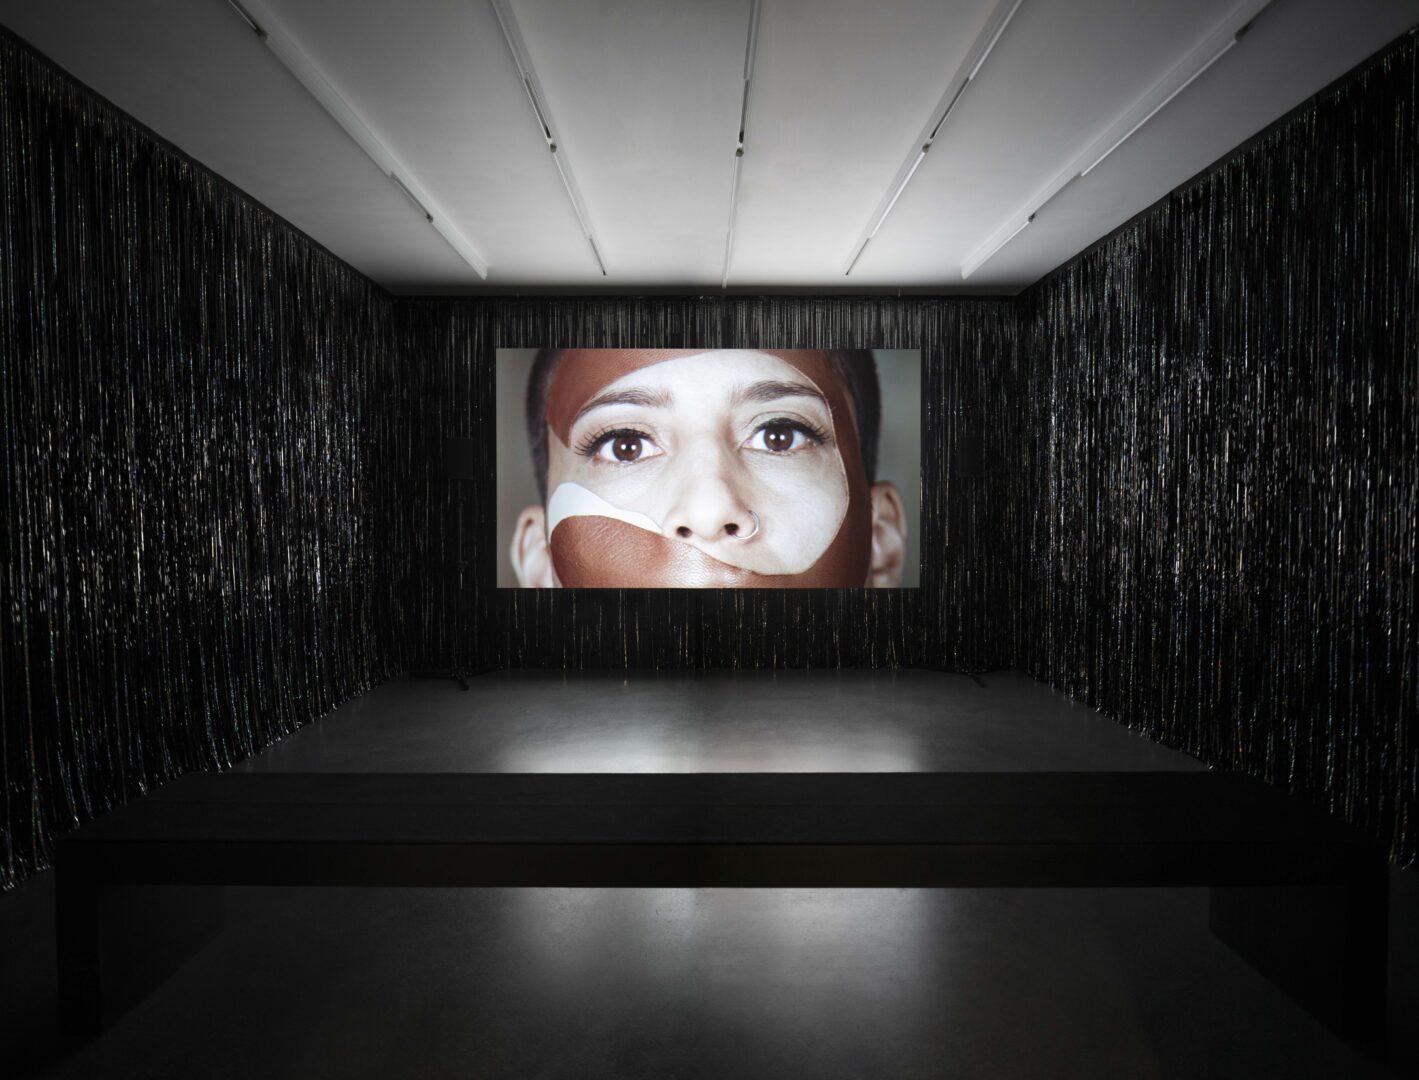 Exhibition View Groupshow «Up to and Including Limits: After Carolee Schneemann; view on Katrina Daschner, Pferdebusen, 2017» at Muzeum Susch, Susch, 2019-2020 / Photo: Maja Wirkus / Courtesy: the artist and Muzeum Susch